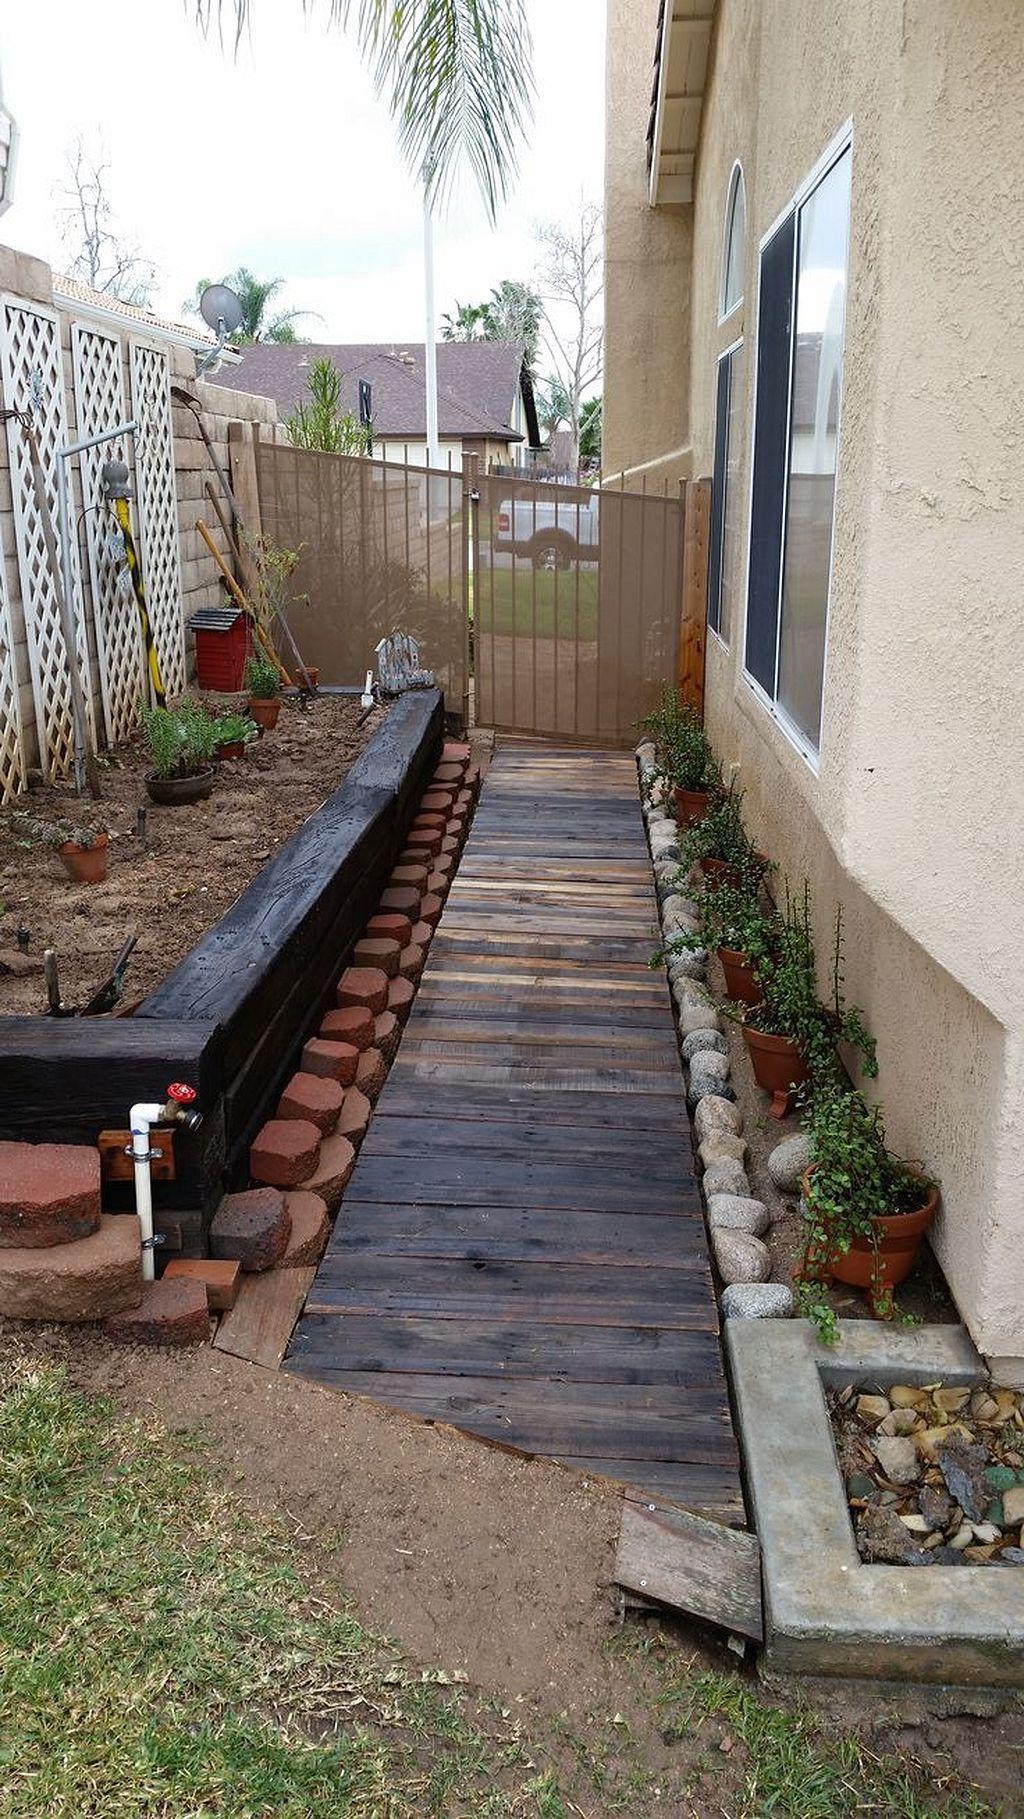 50+ Stunning Repurposing Recycled Pallet Ideas in 2020 ... on Side Yard Walkway Ideas id=81899